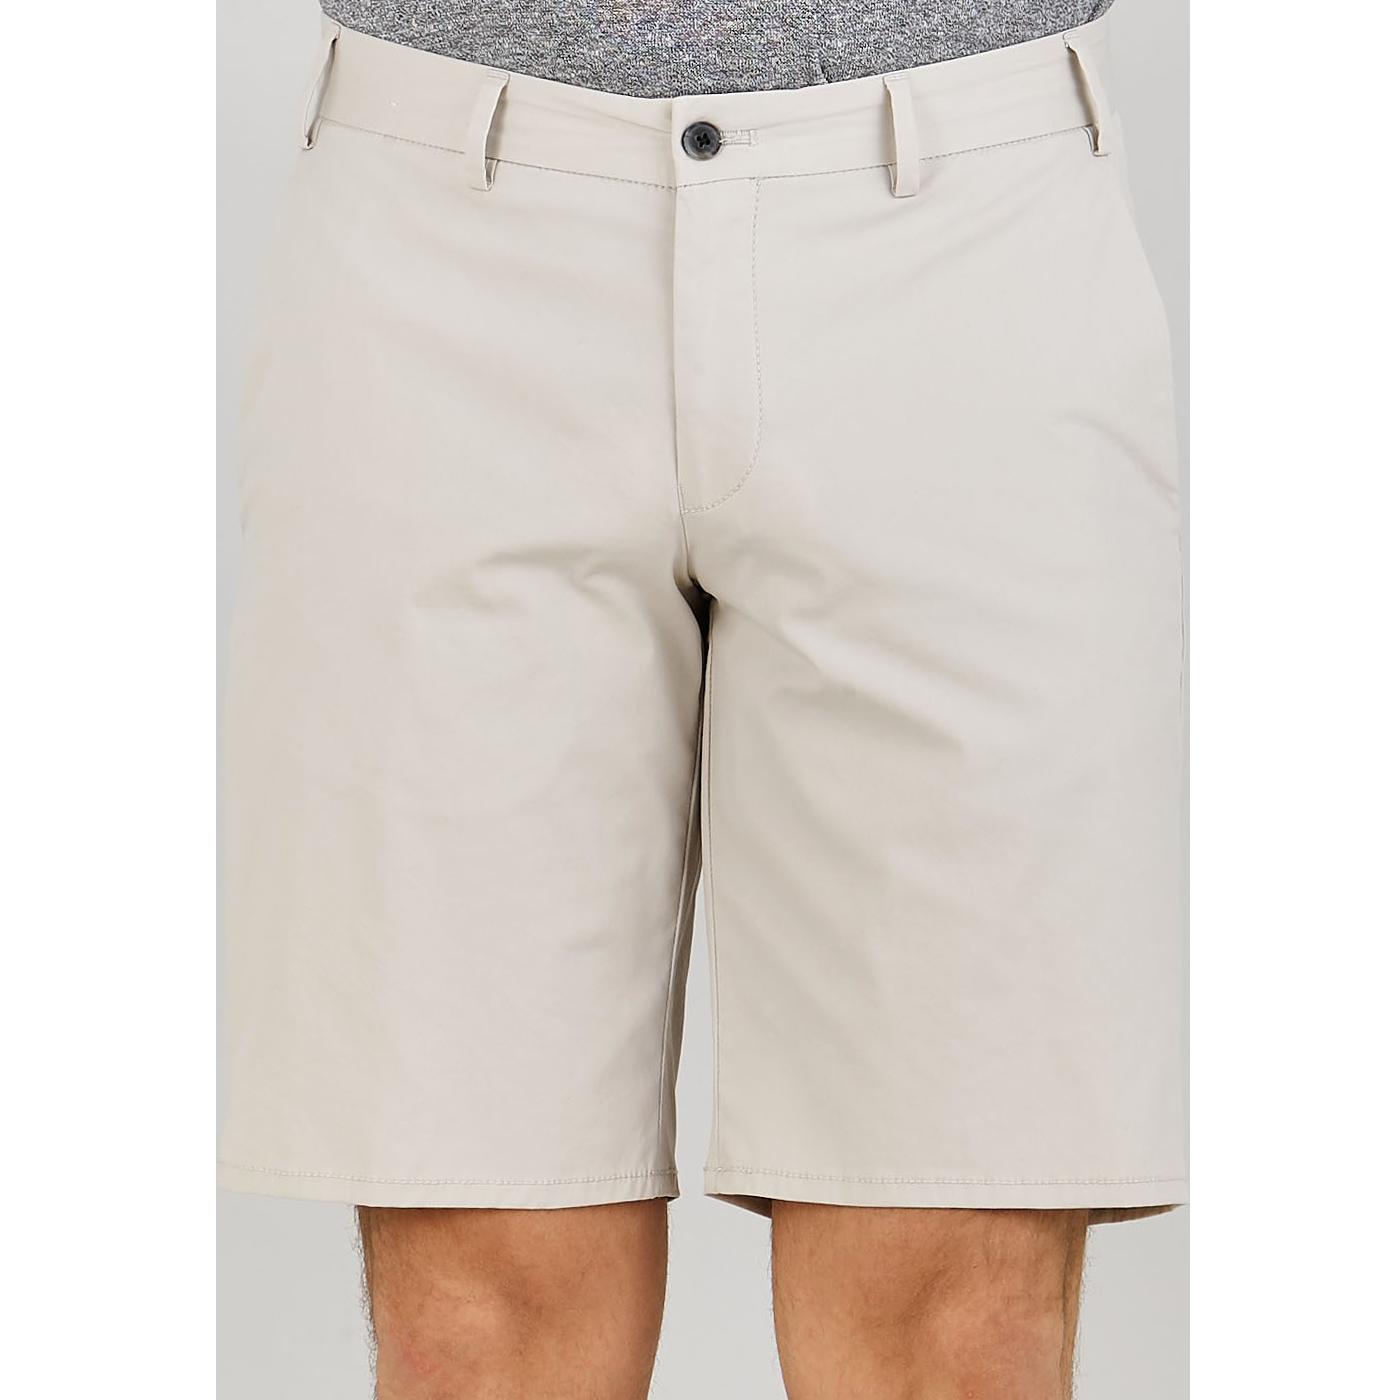 Hiltl Beige Cotton Nylon Traveller Slim Shorts Front